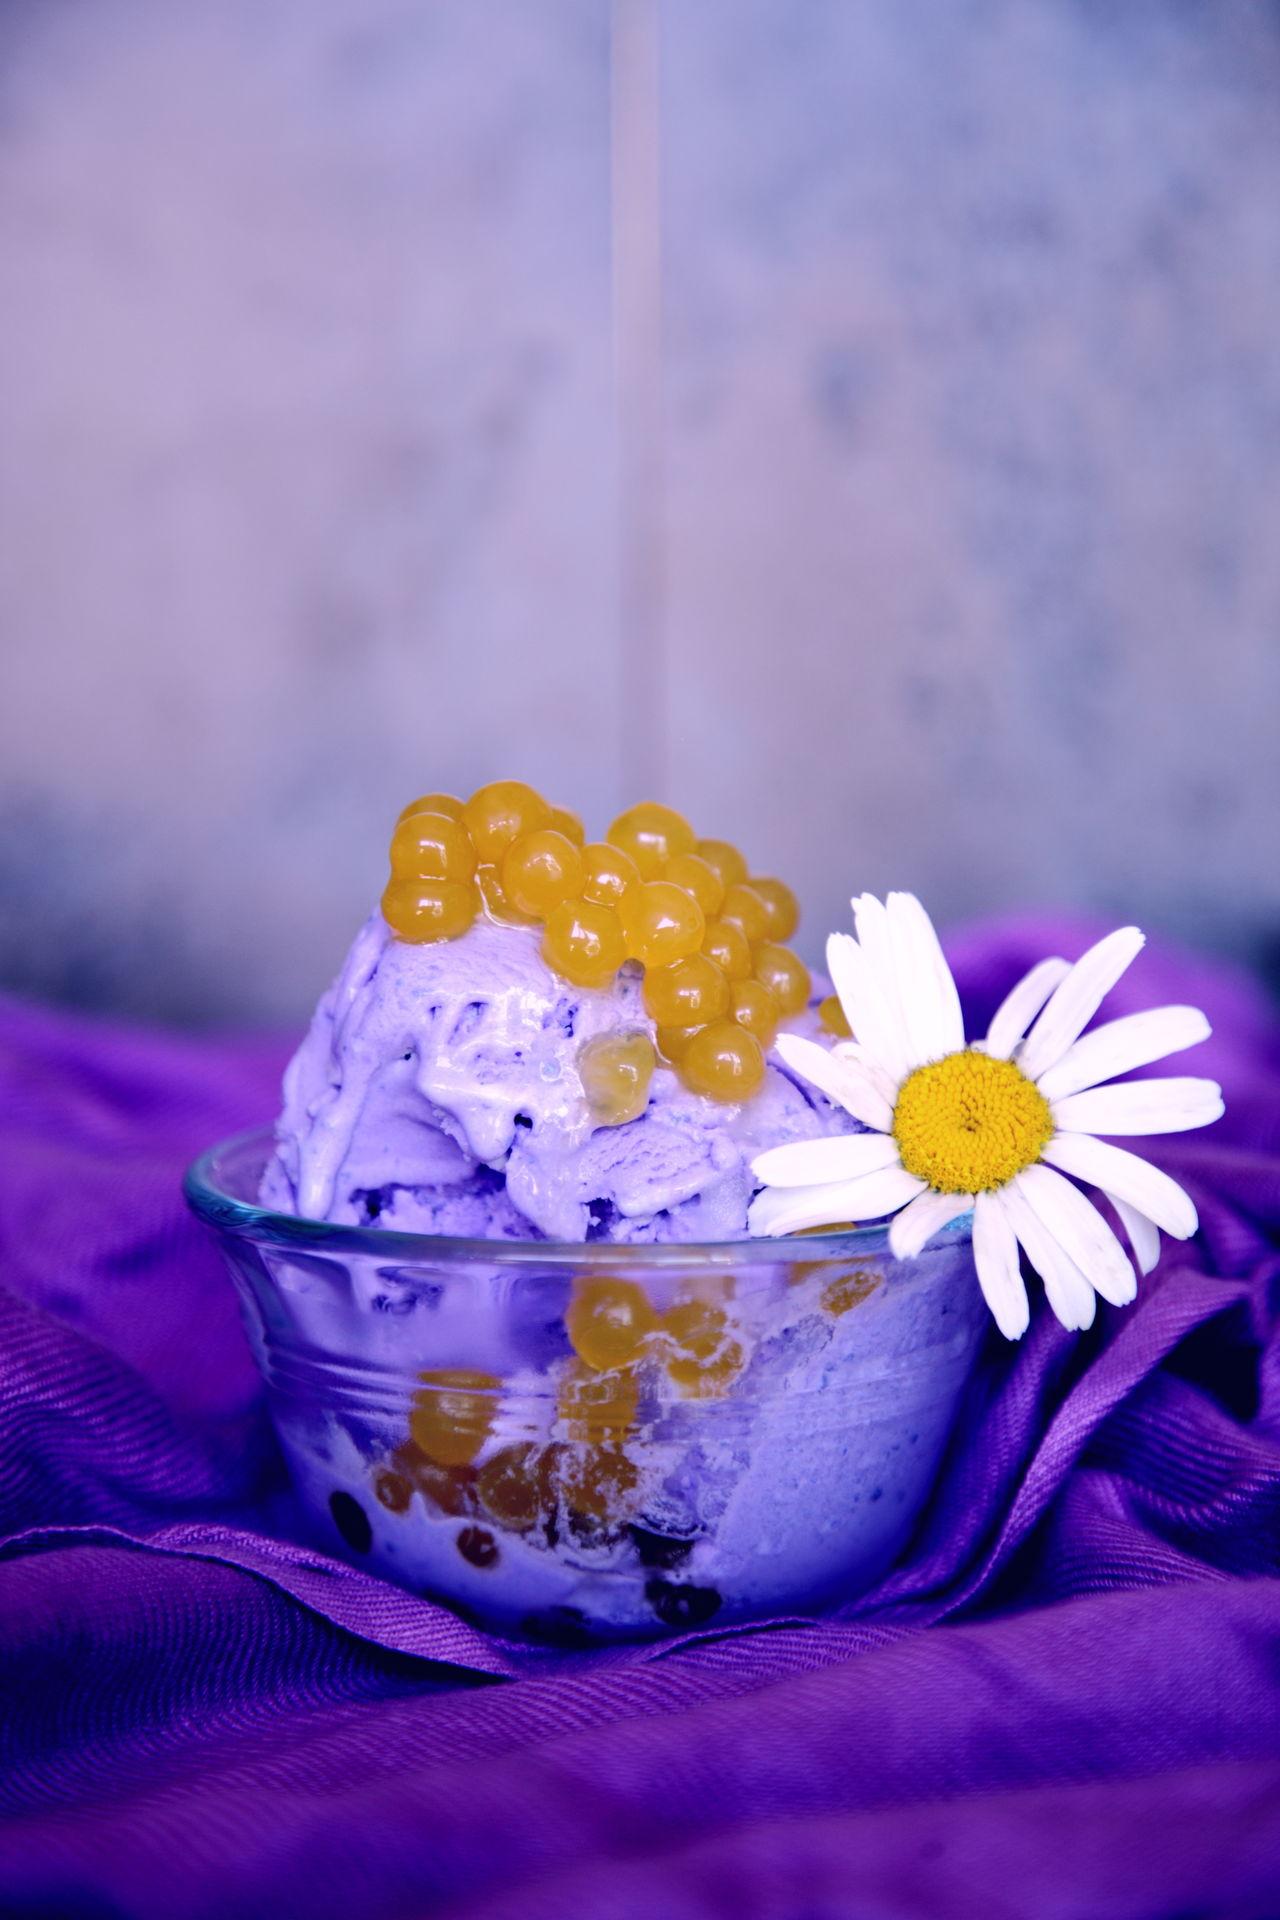 Boba Caviar Cold Colors Daisy Dessert Filipino Filipinofood Flower Food Food Styling Frozen Fun Gelato Gold Helado Ice Cream Mango Pearls Purple Sweet Food Tapioca Ube  Violet Yam